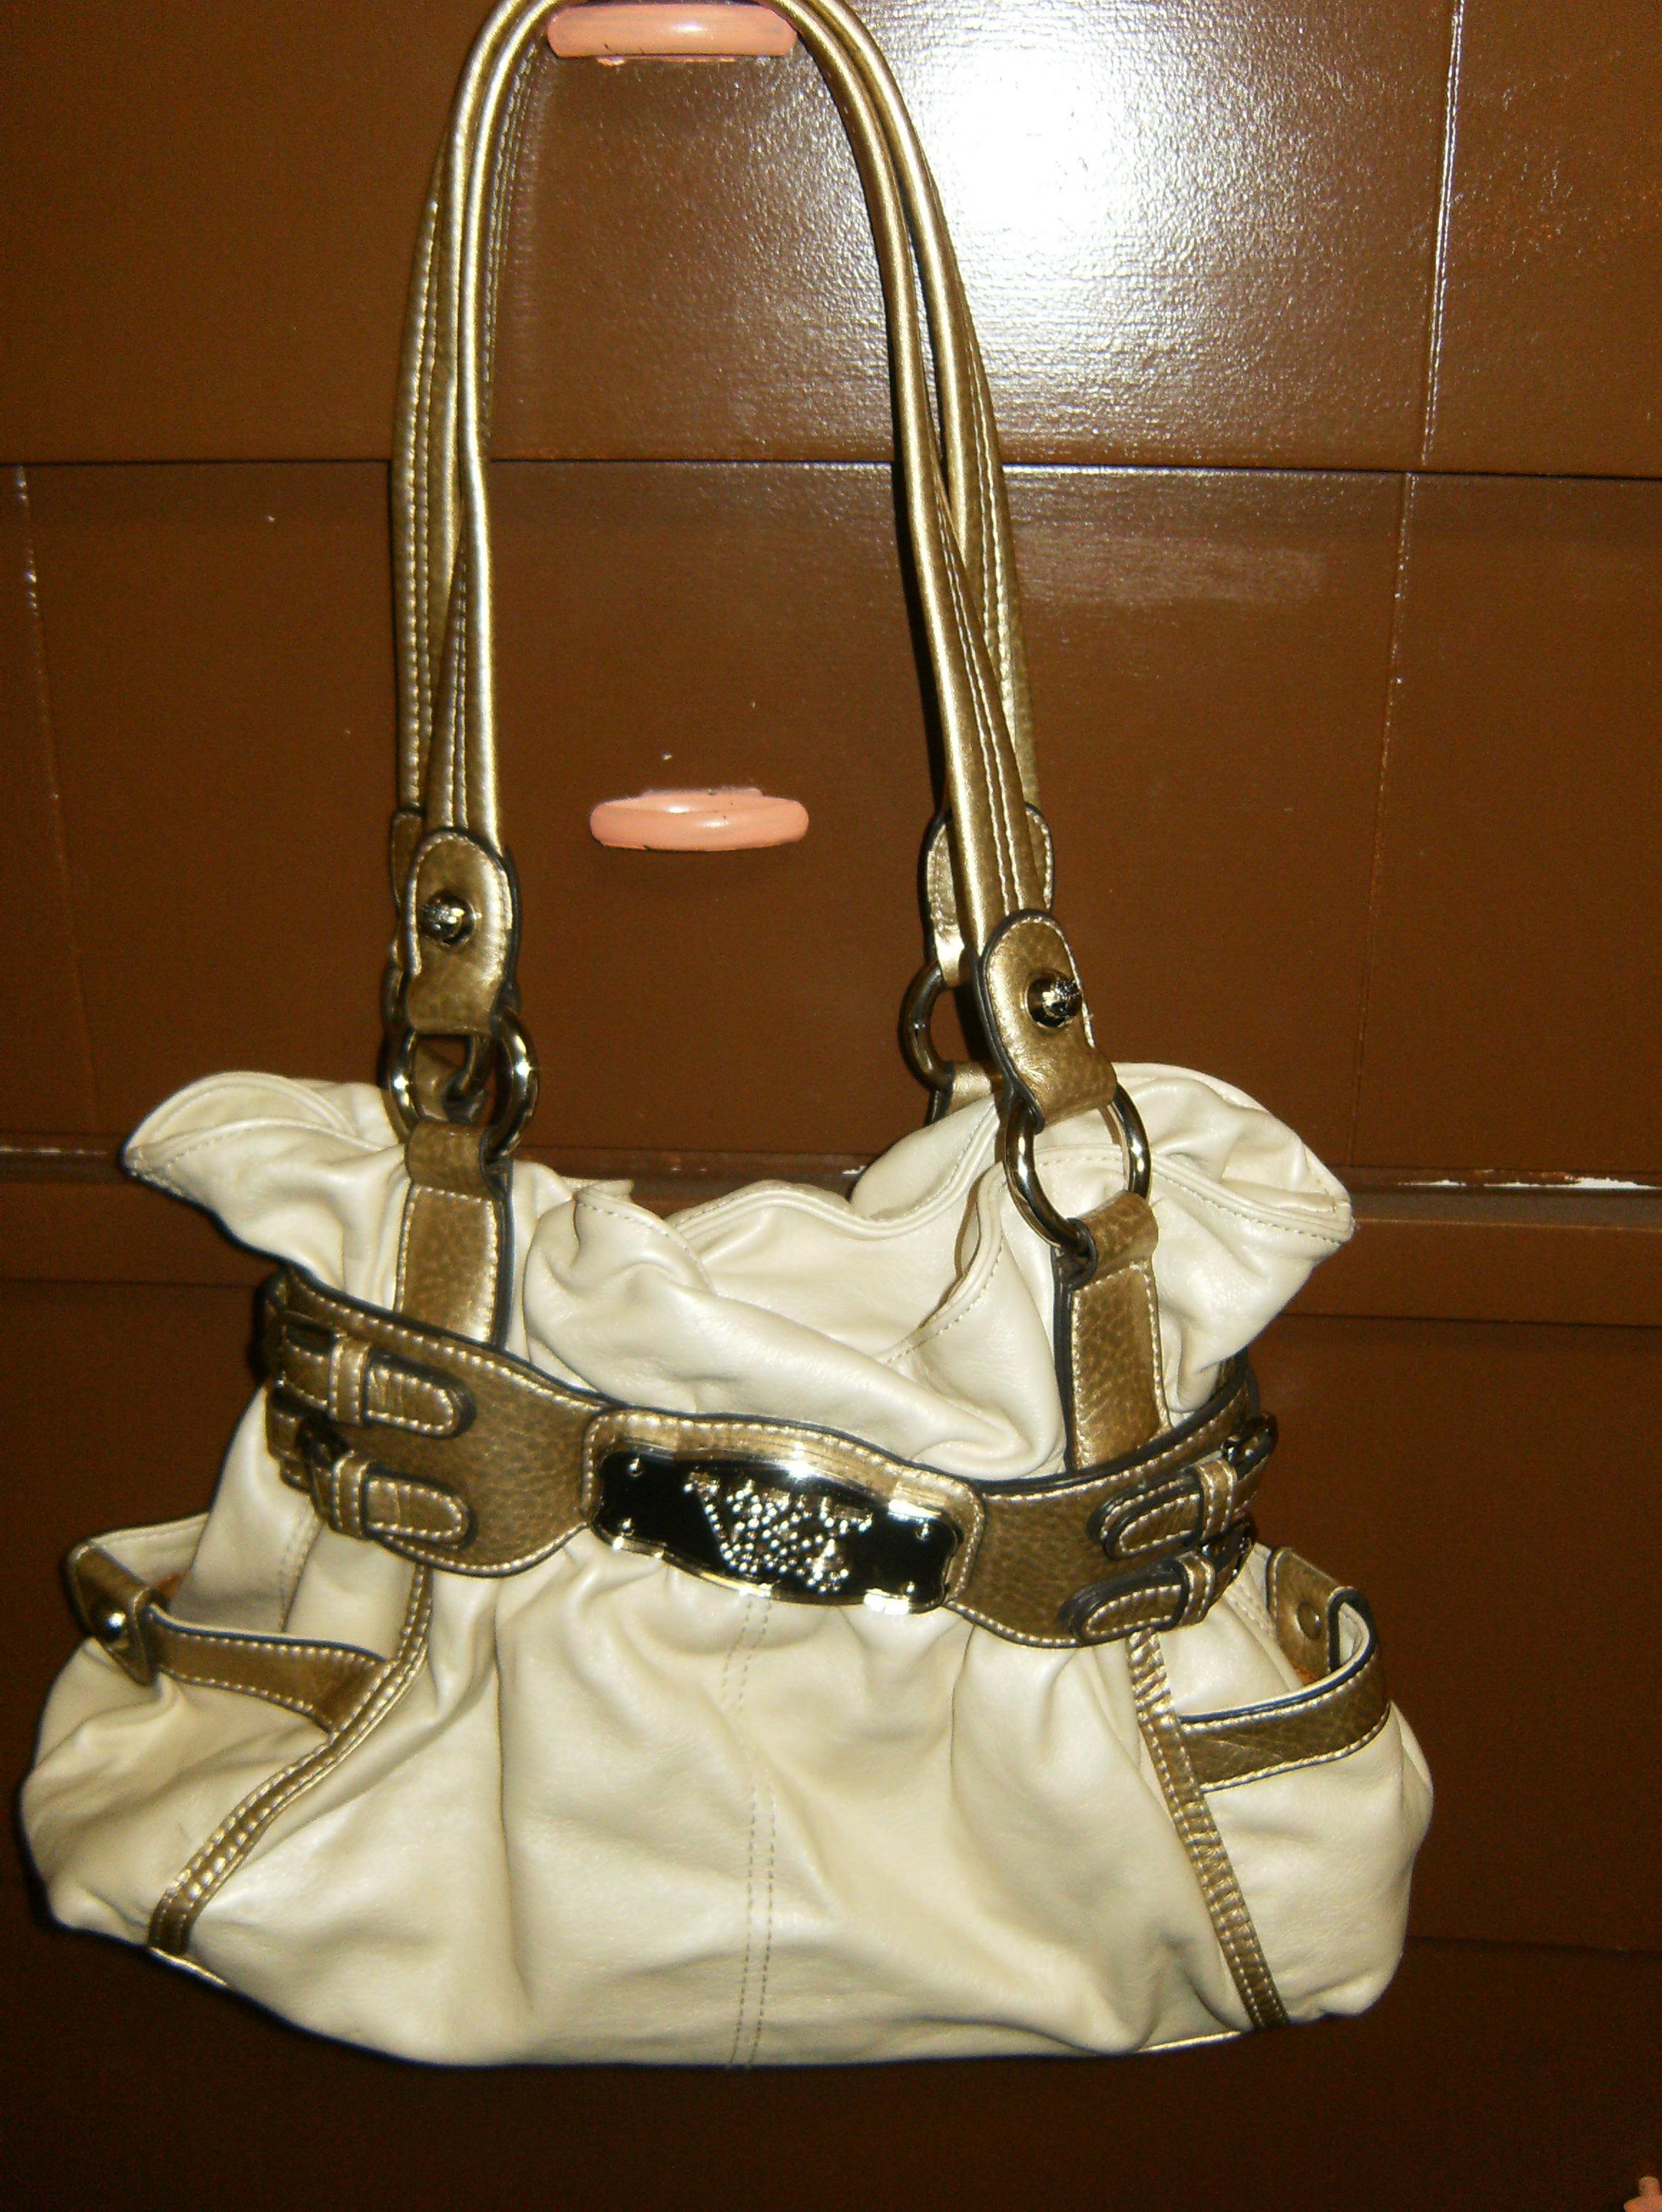 58ba96711d54 Kathy Van Zeeland Purses Shoulder Bag - Best Purse Image Ccdbb.Org